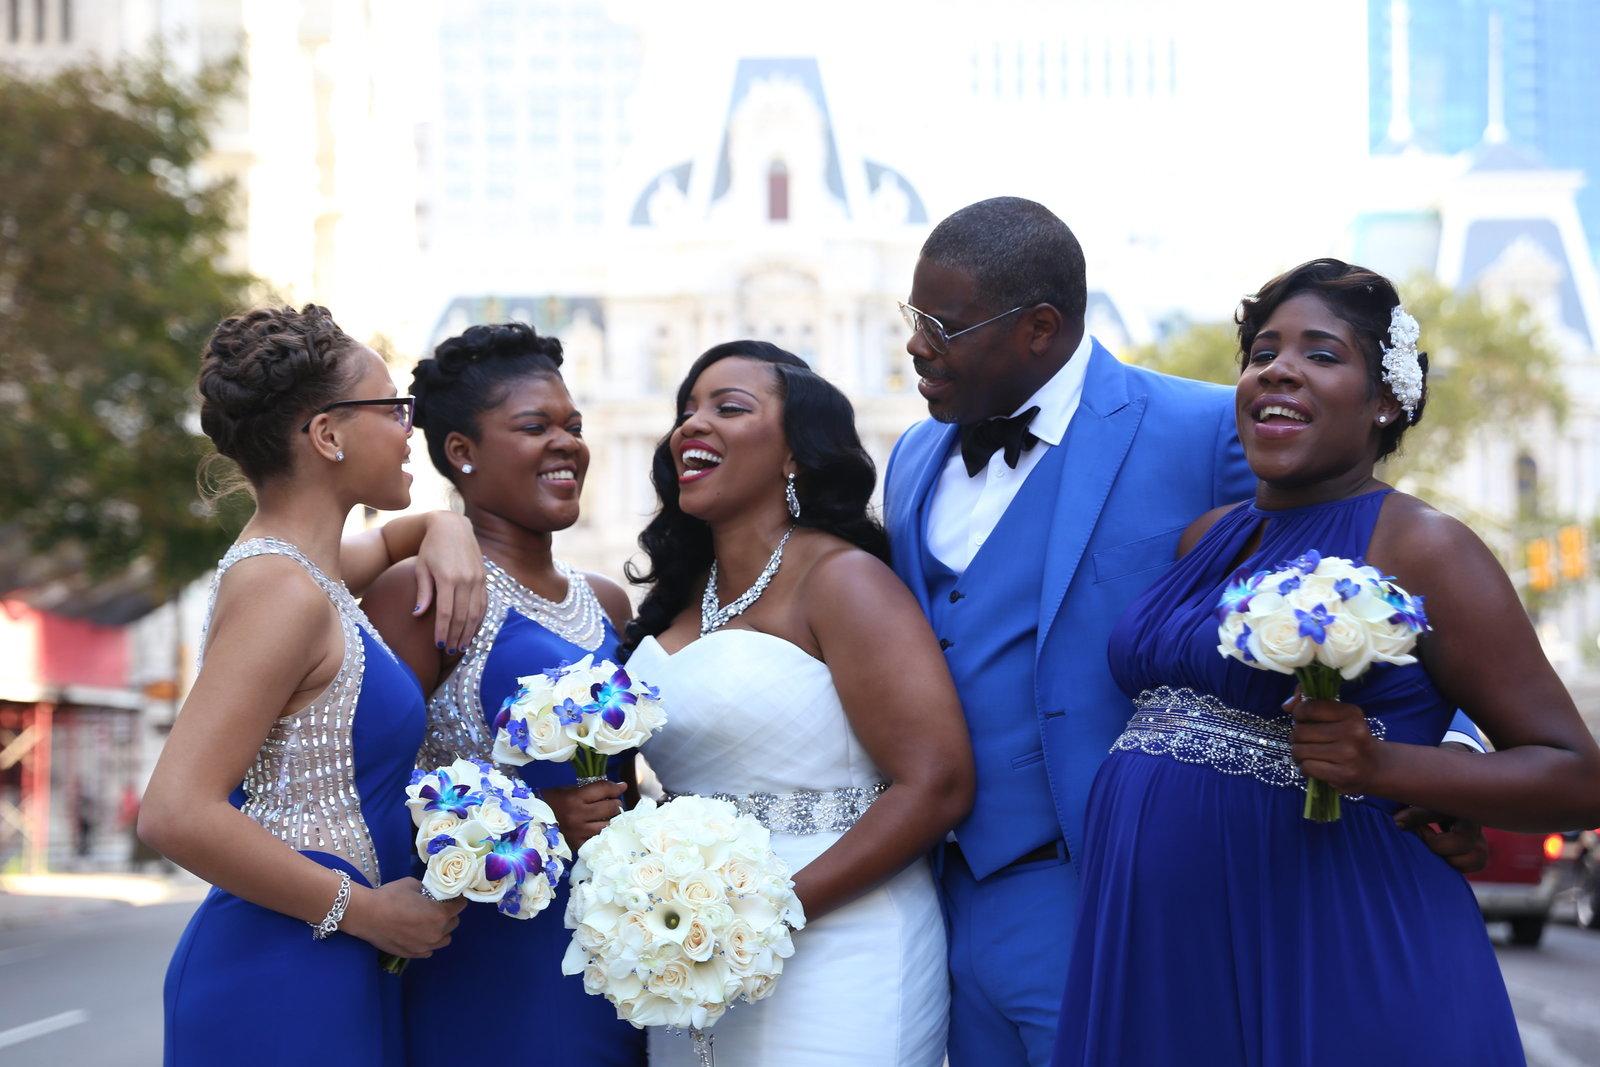 Stotesbury Mansion ceremony and wedding reception bridal portraits at City Hall